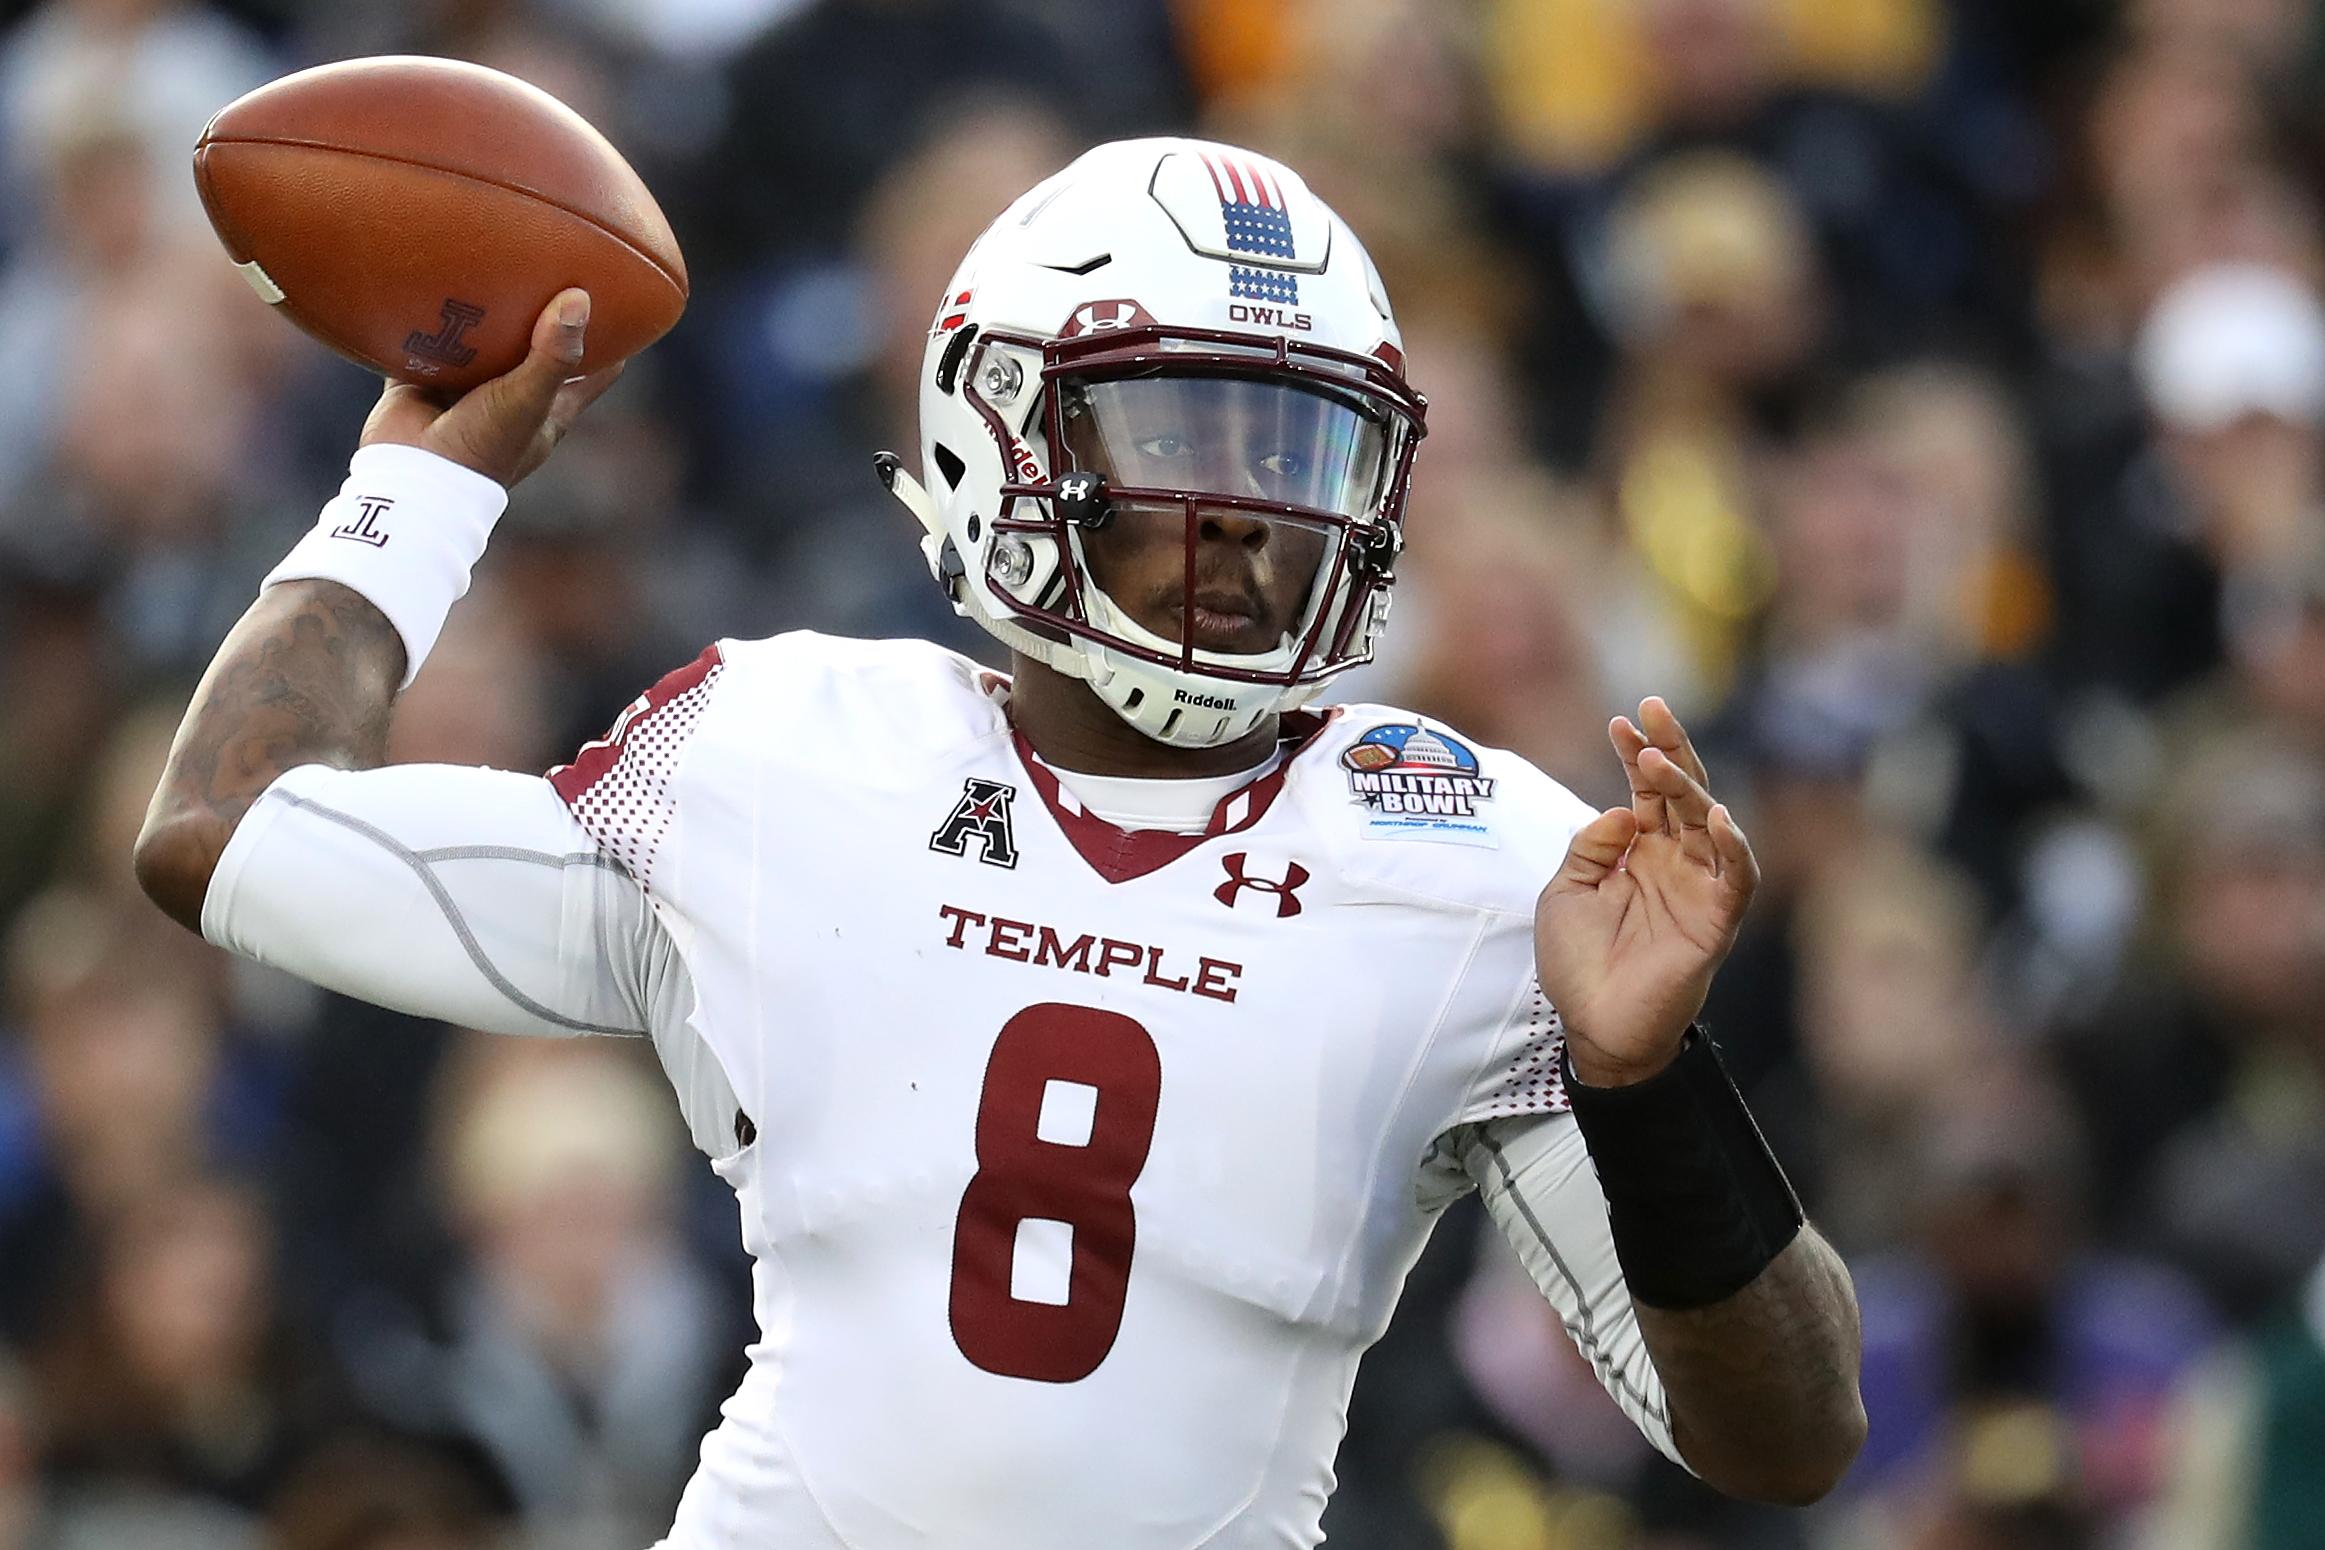 Temple quarterback Phillip (P.J.) Walker. (Photo by Matt Hazlett/Getty Images)